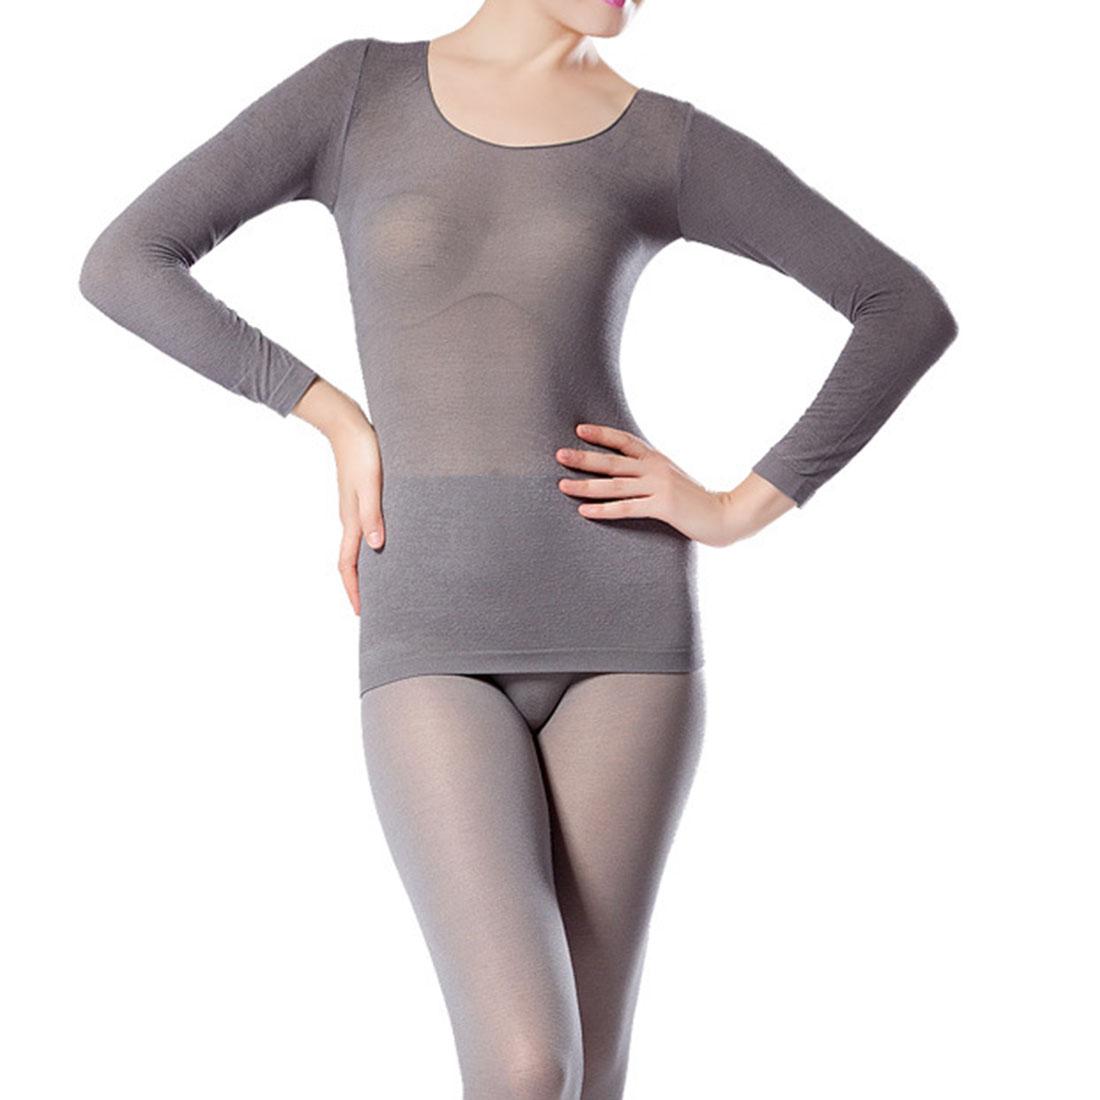 19f8ccb2881 Viscose   Nylon Women Thermal Underwear Sets flexible   thermal ...